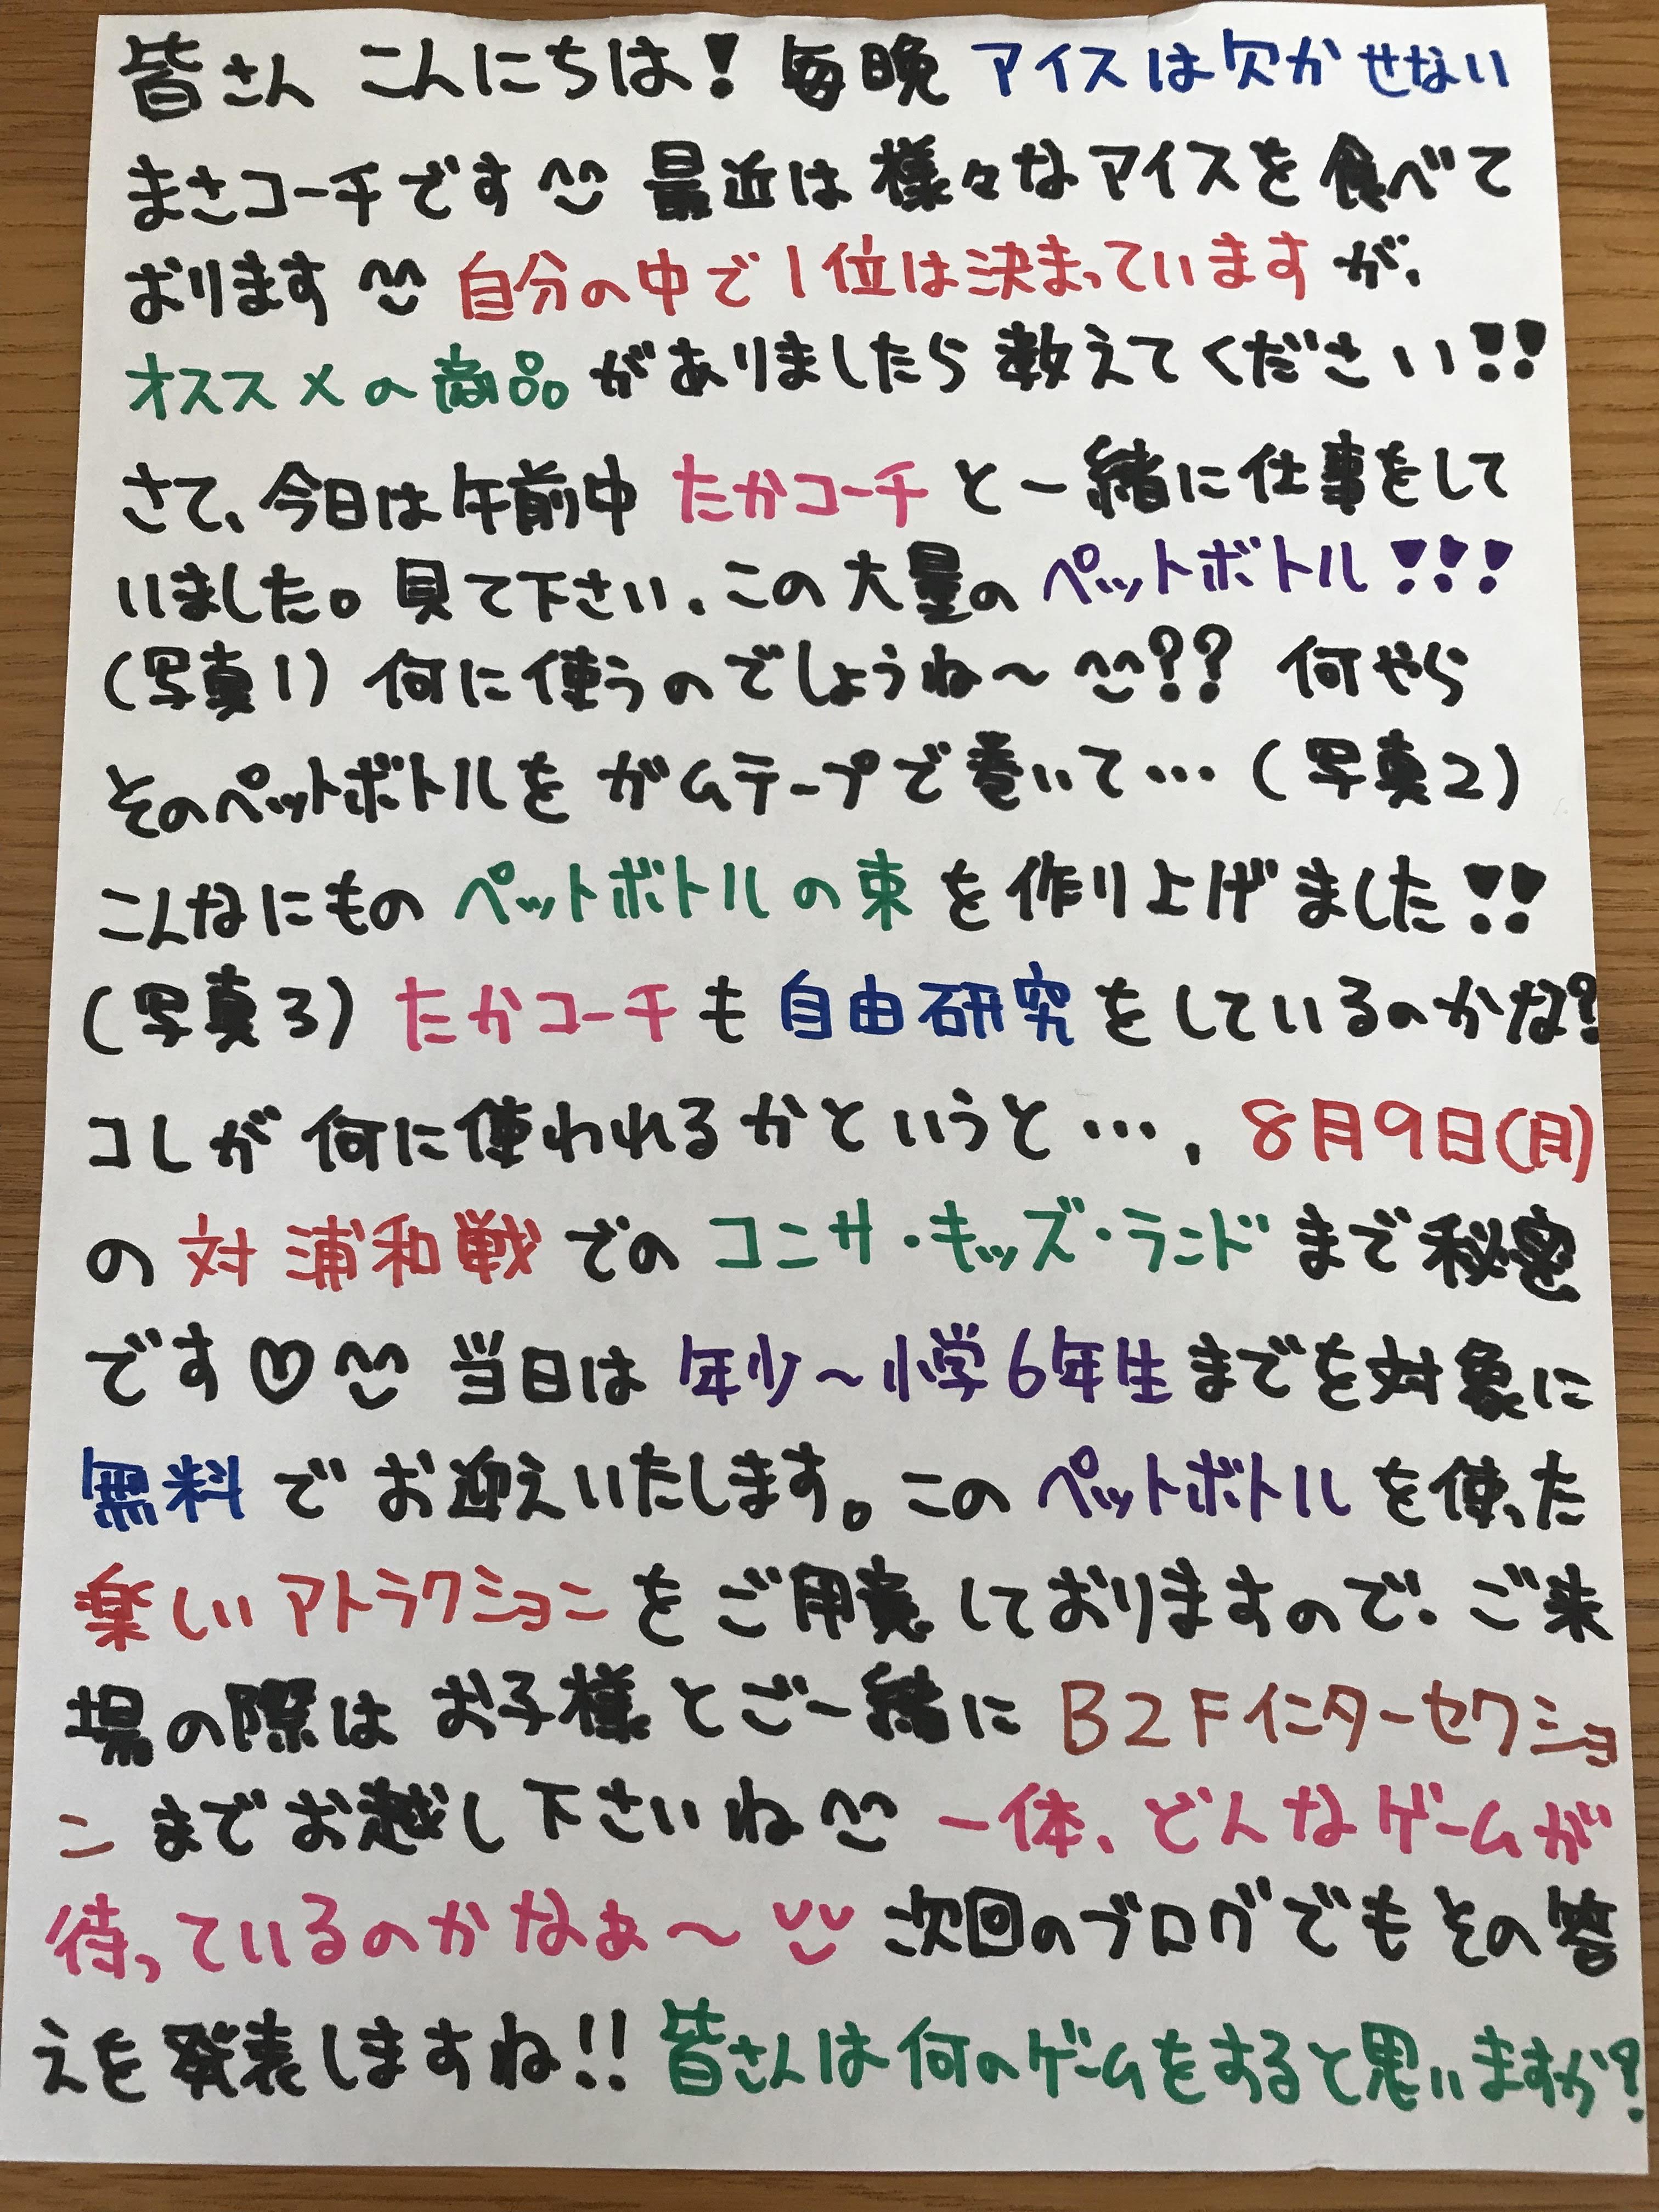 https://chsc.jp/news/up_images/%2326%281%29.jpg